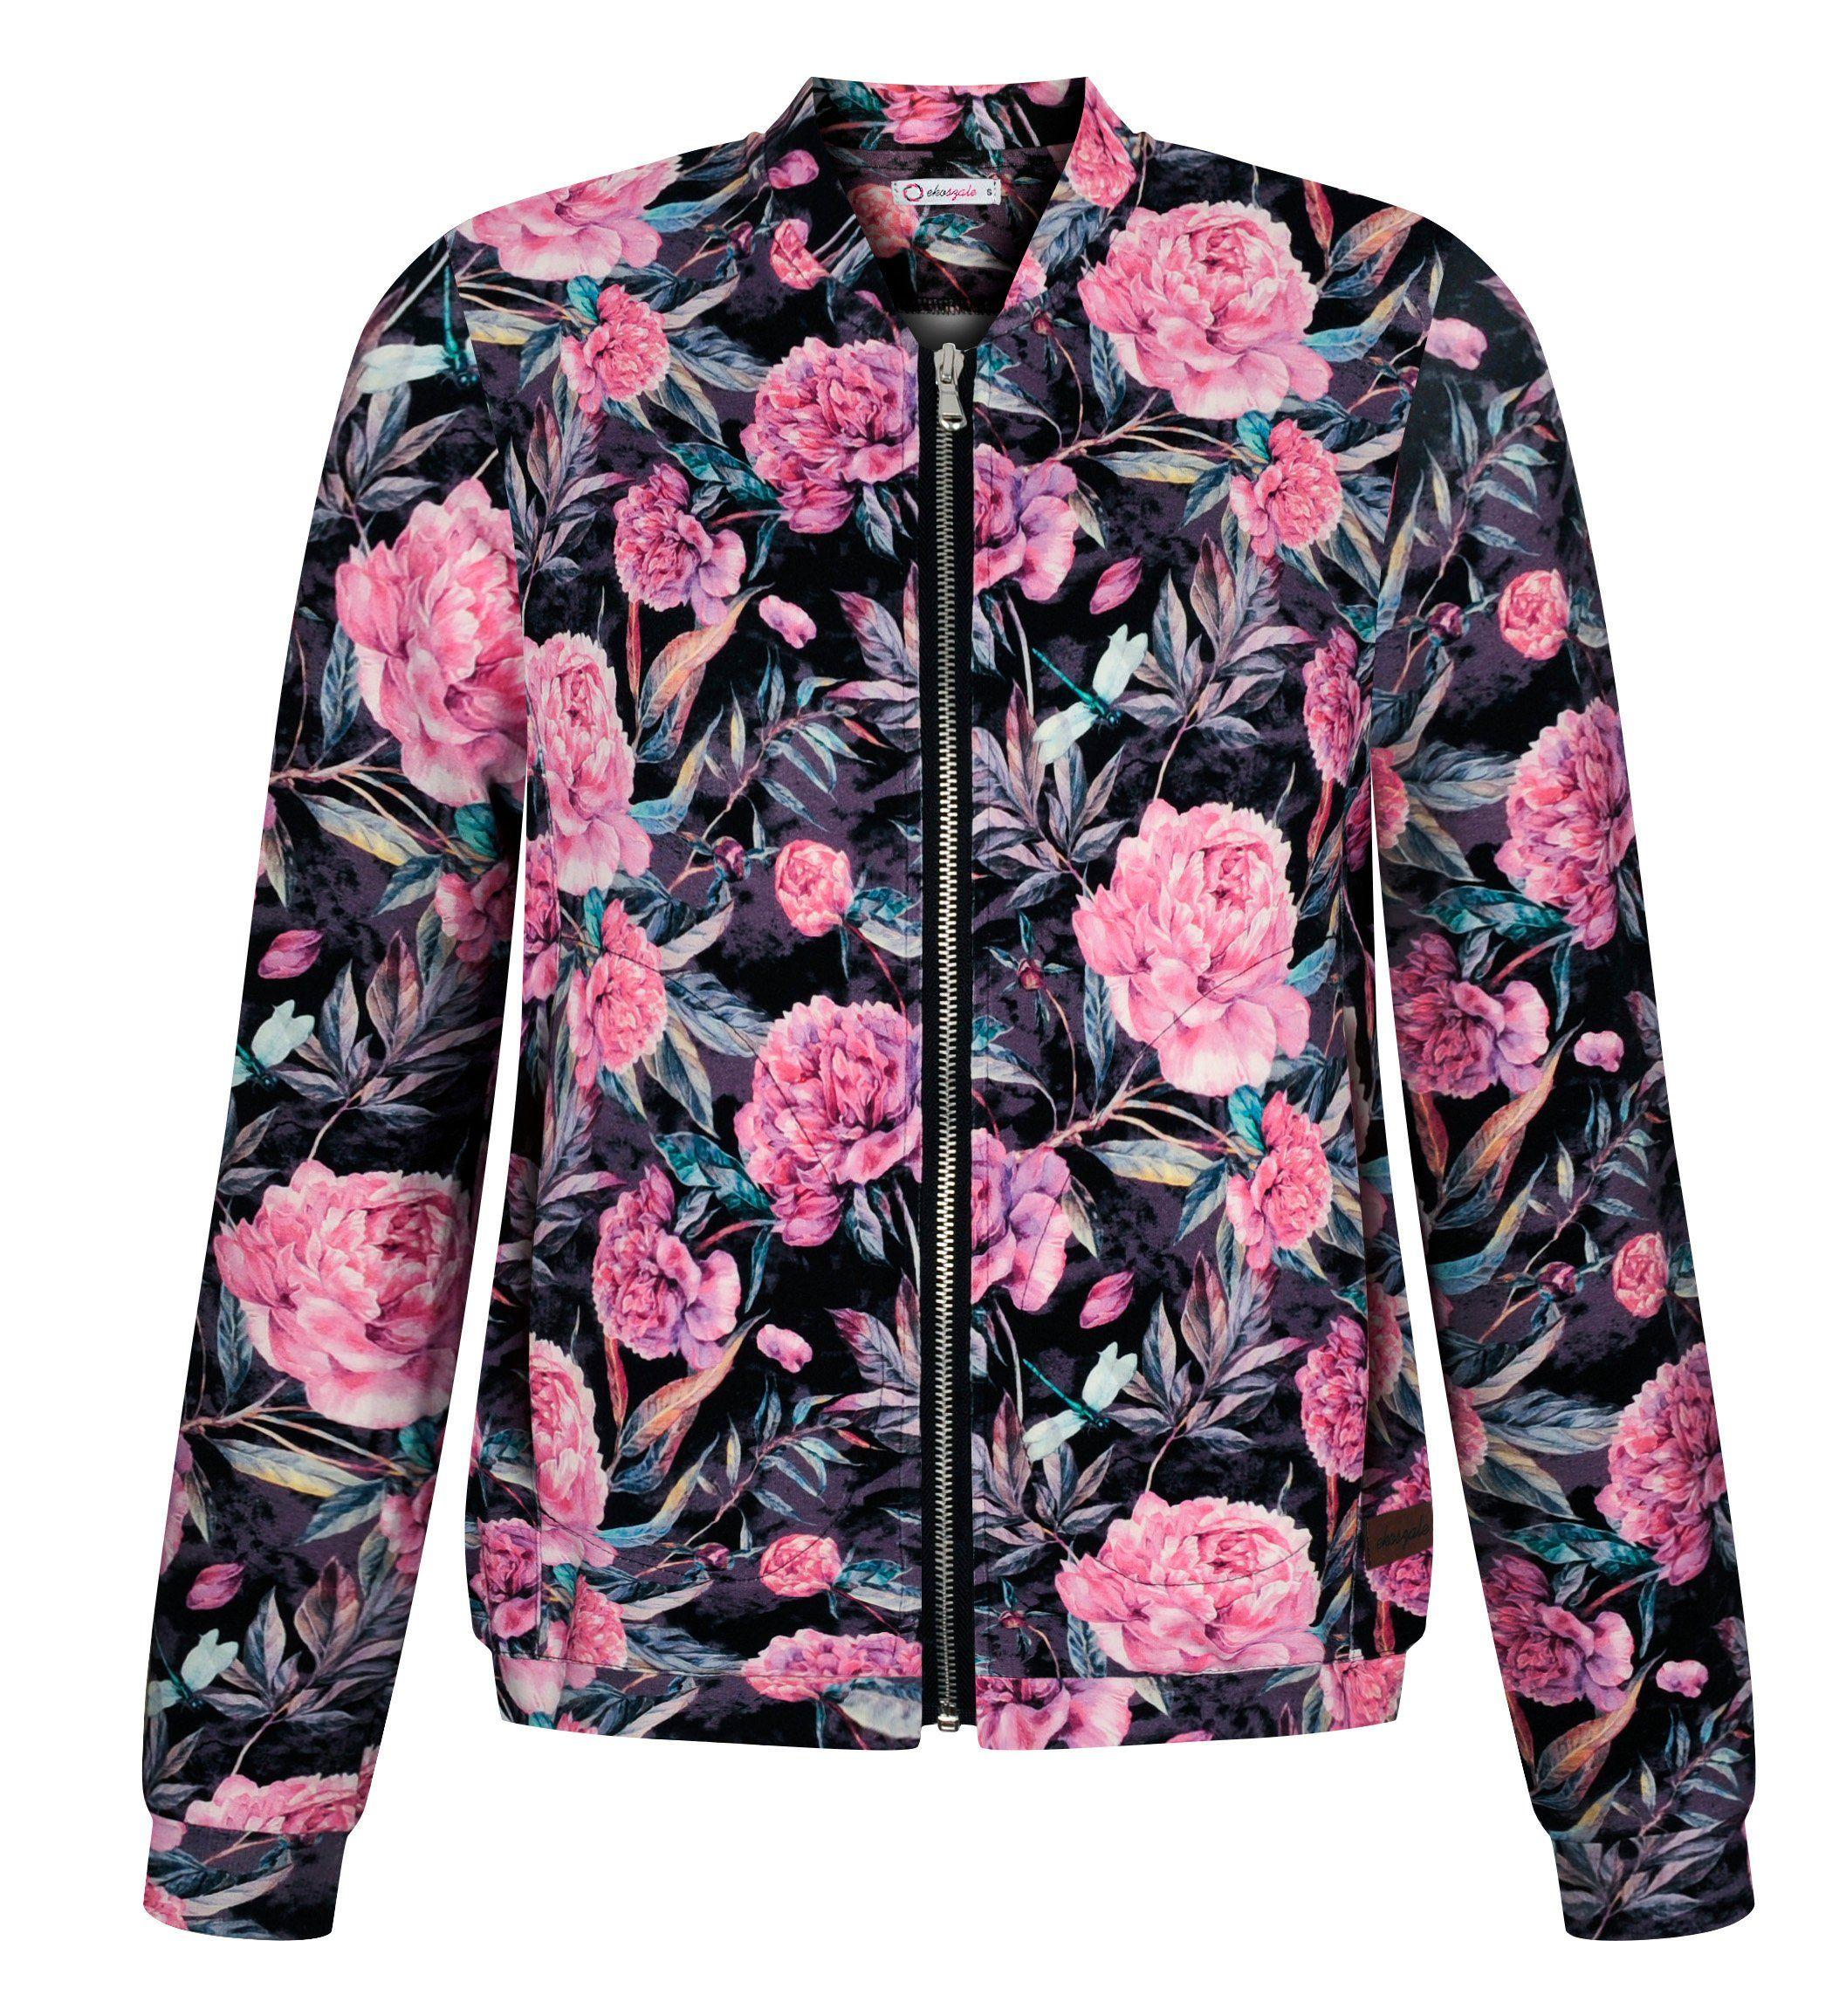 Black Women Bomber Boho Jacket Classic Women S Bomber Floral Jacket Floral Blazer Women S Bomber Printed Jacket Bomber Floral Print Boho Jacket Womens Bomber Floral Jacket